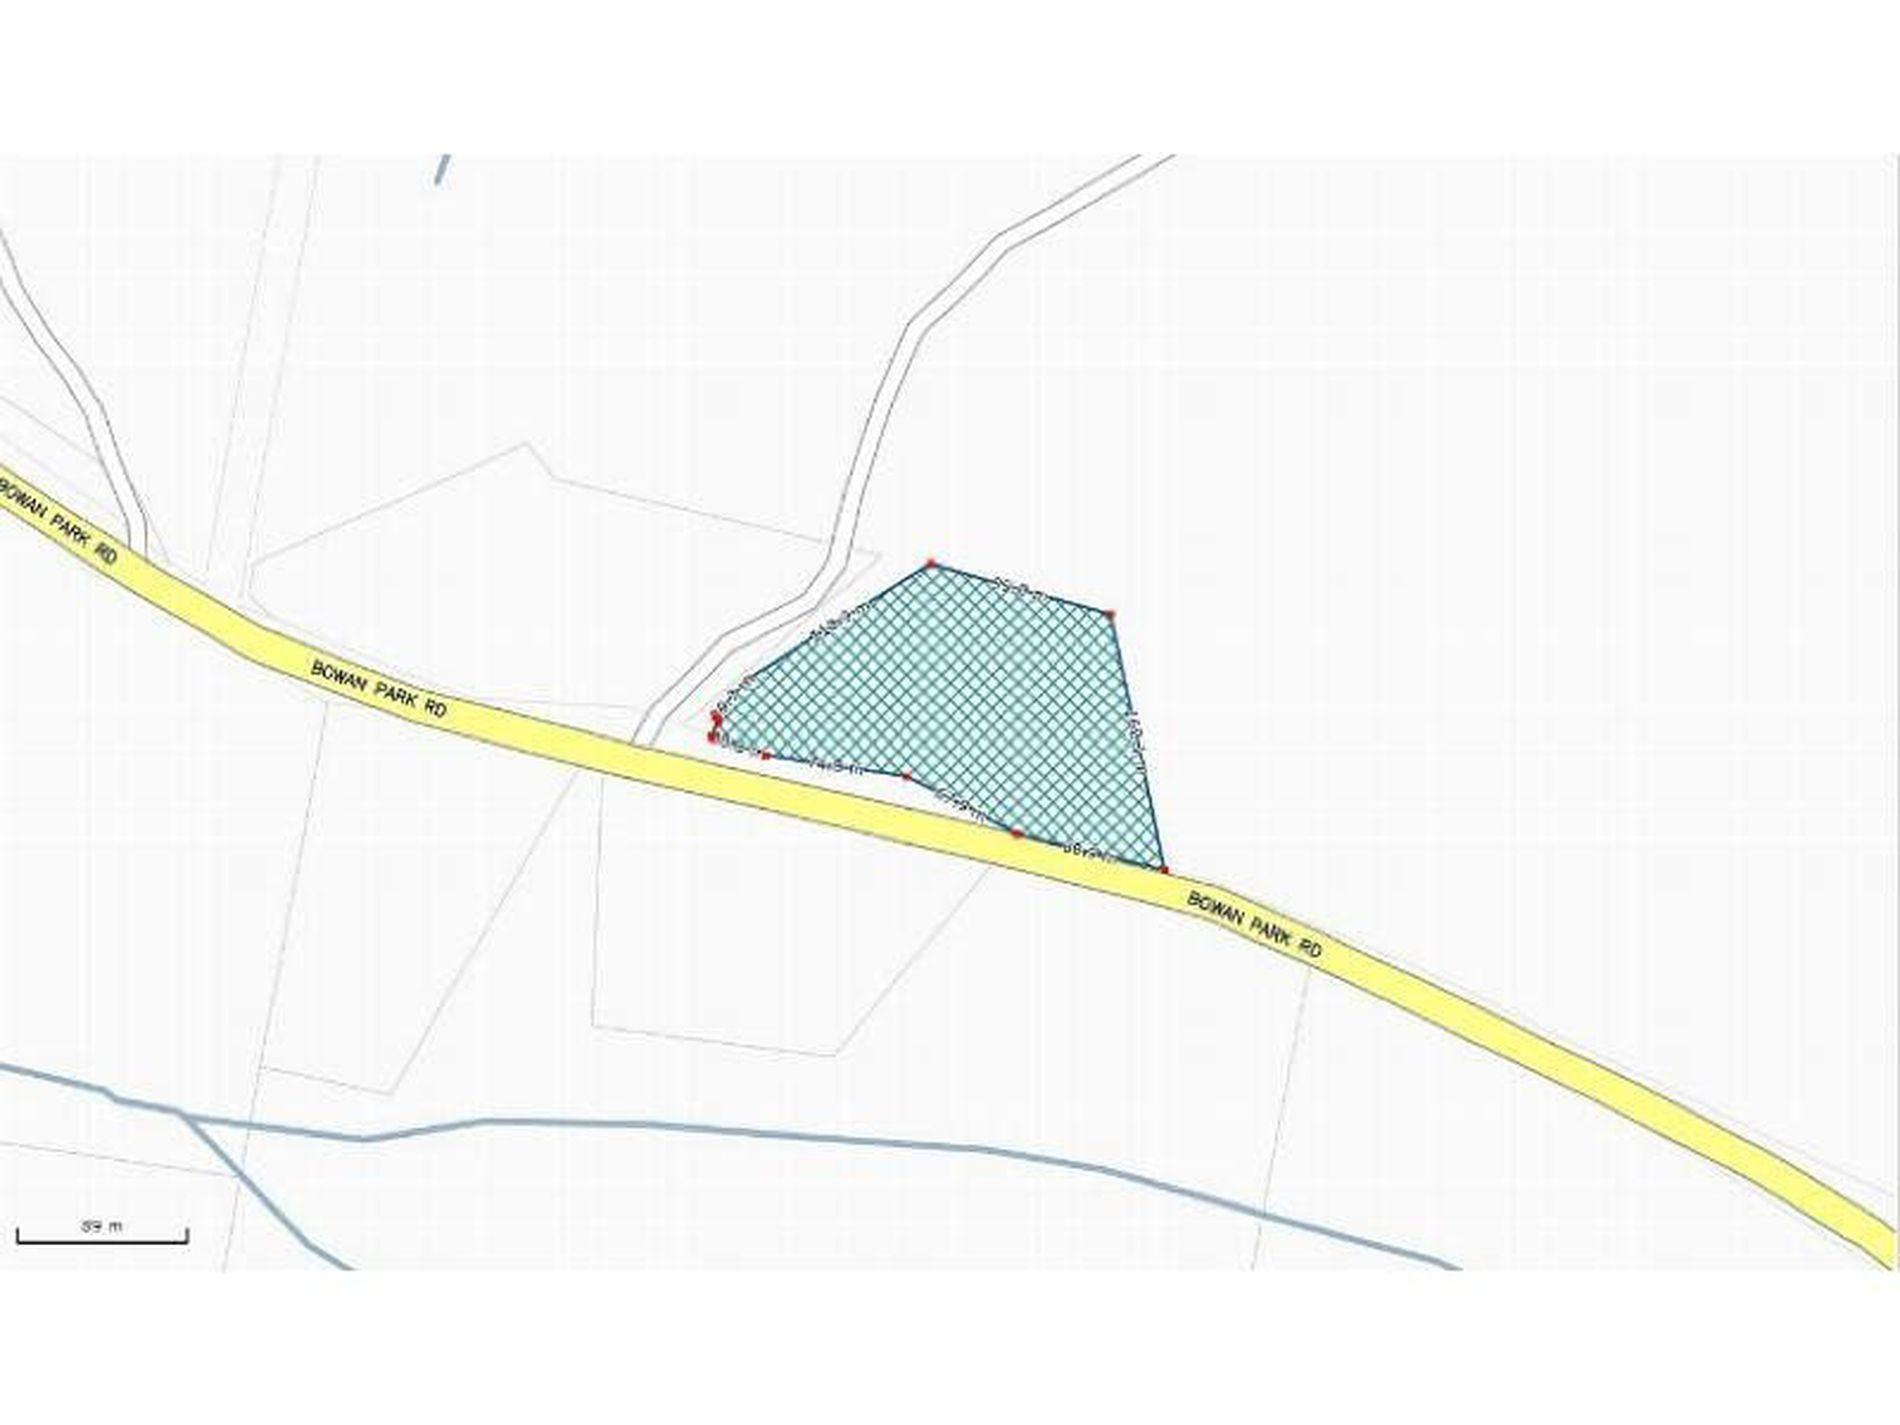 2 / Lot 2 Bowan Park Road, Orange